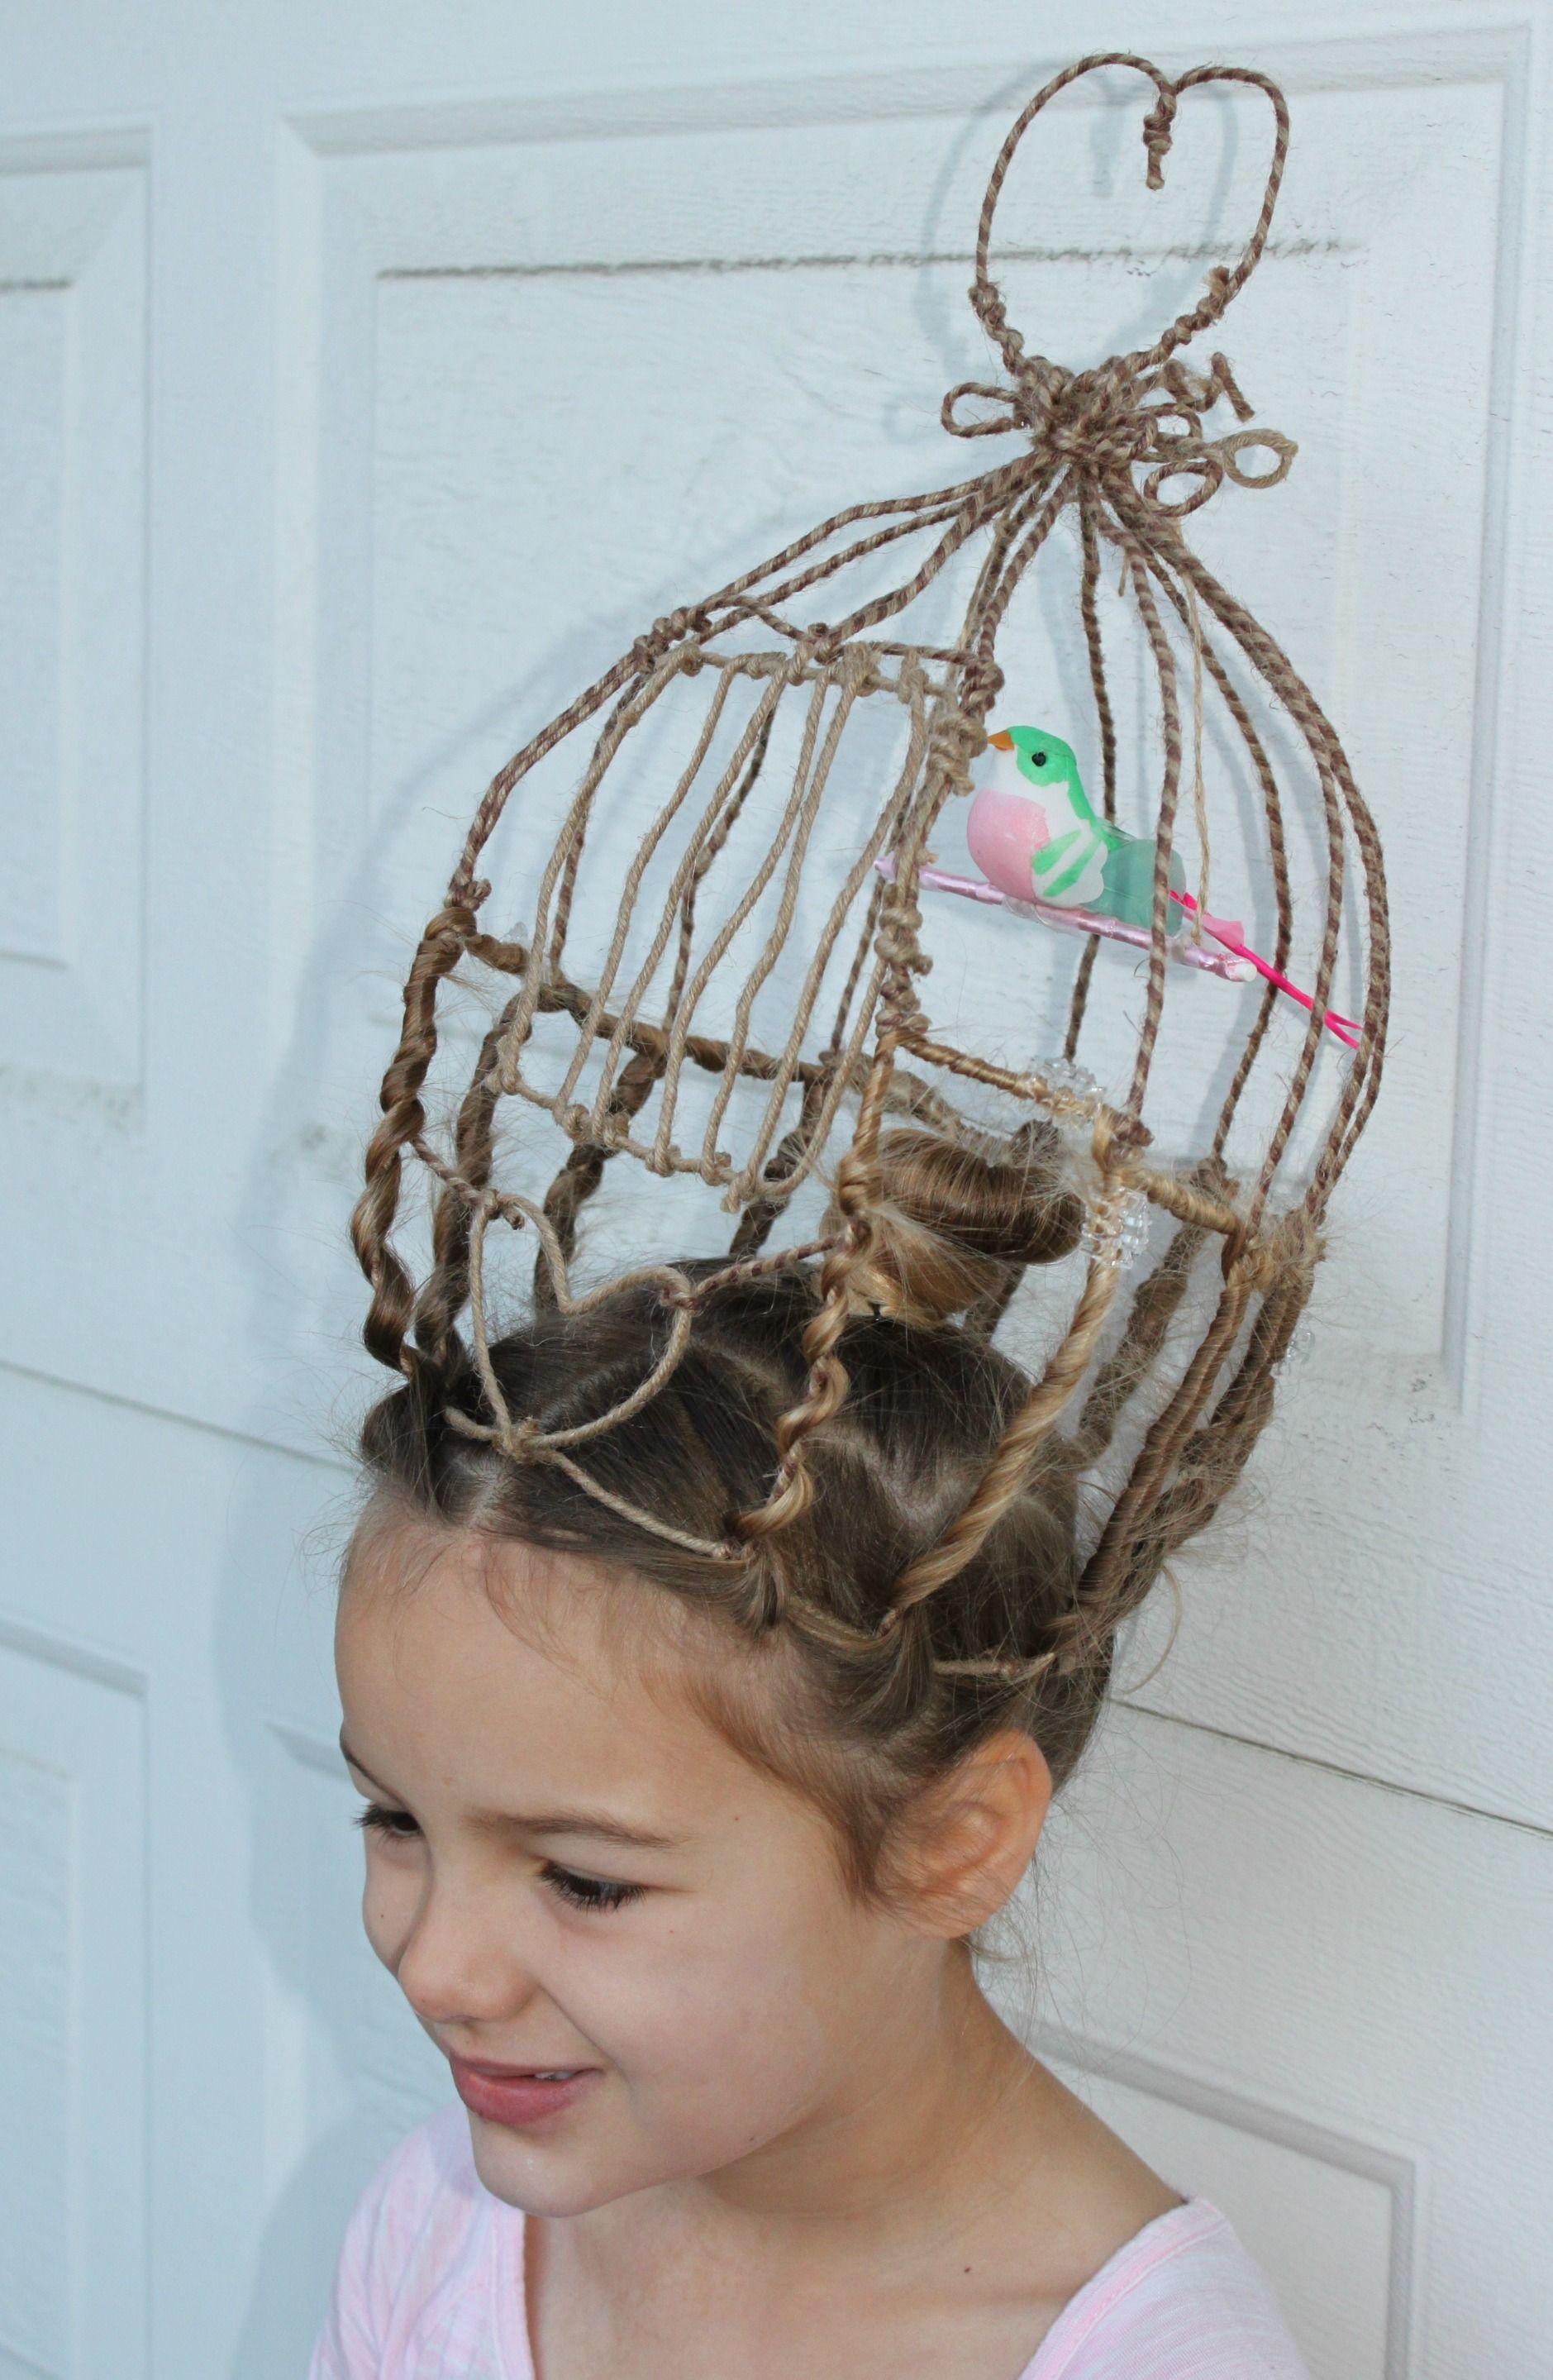 crazy hair day at school! birdcage , bird swinging on perch